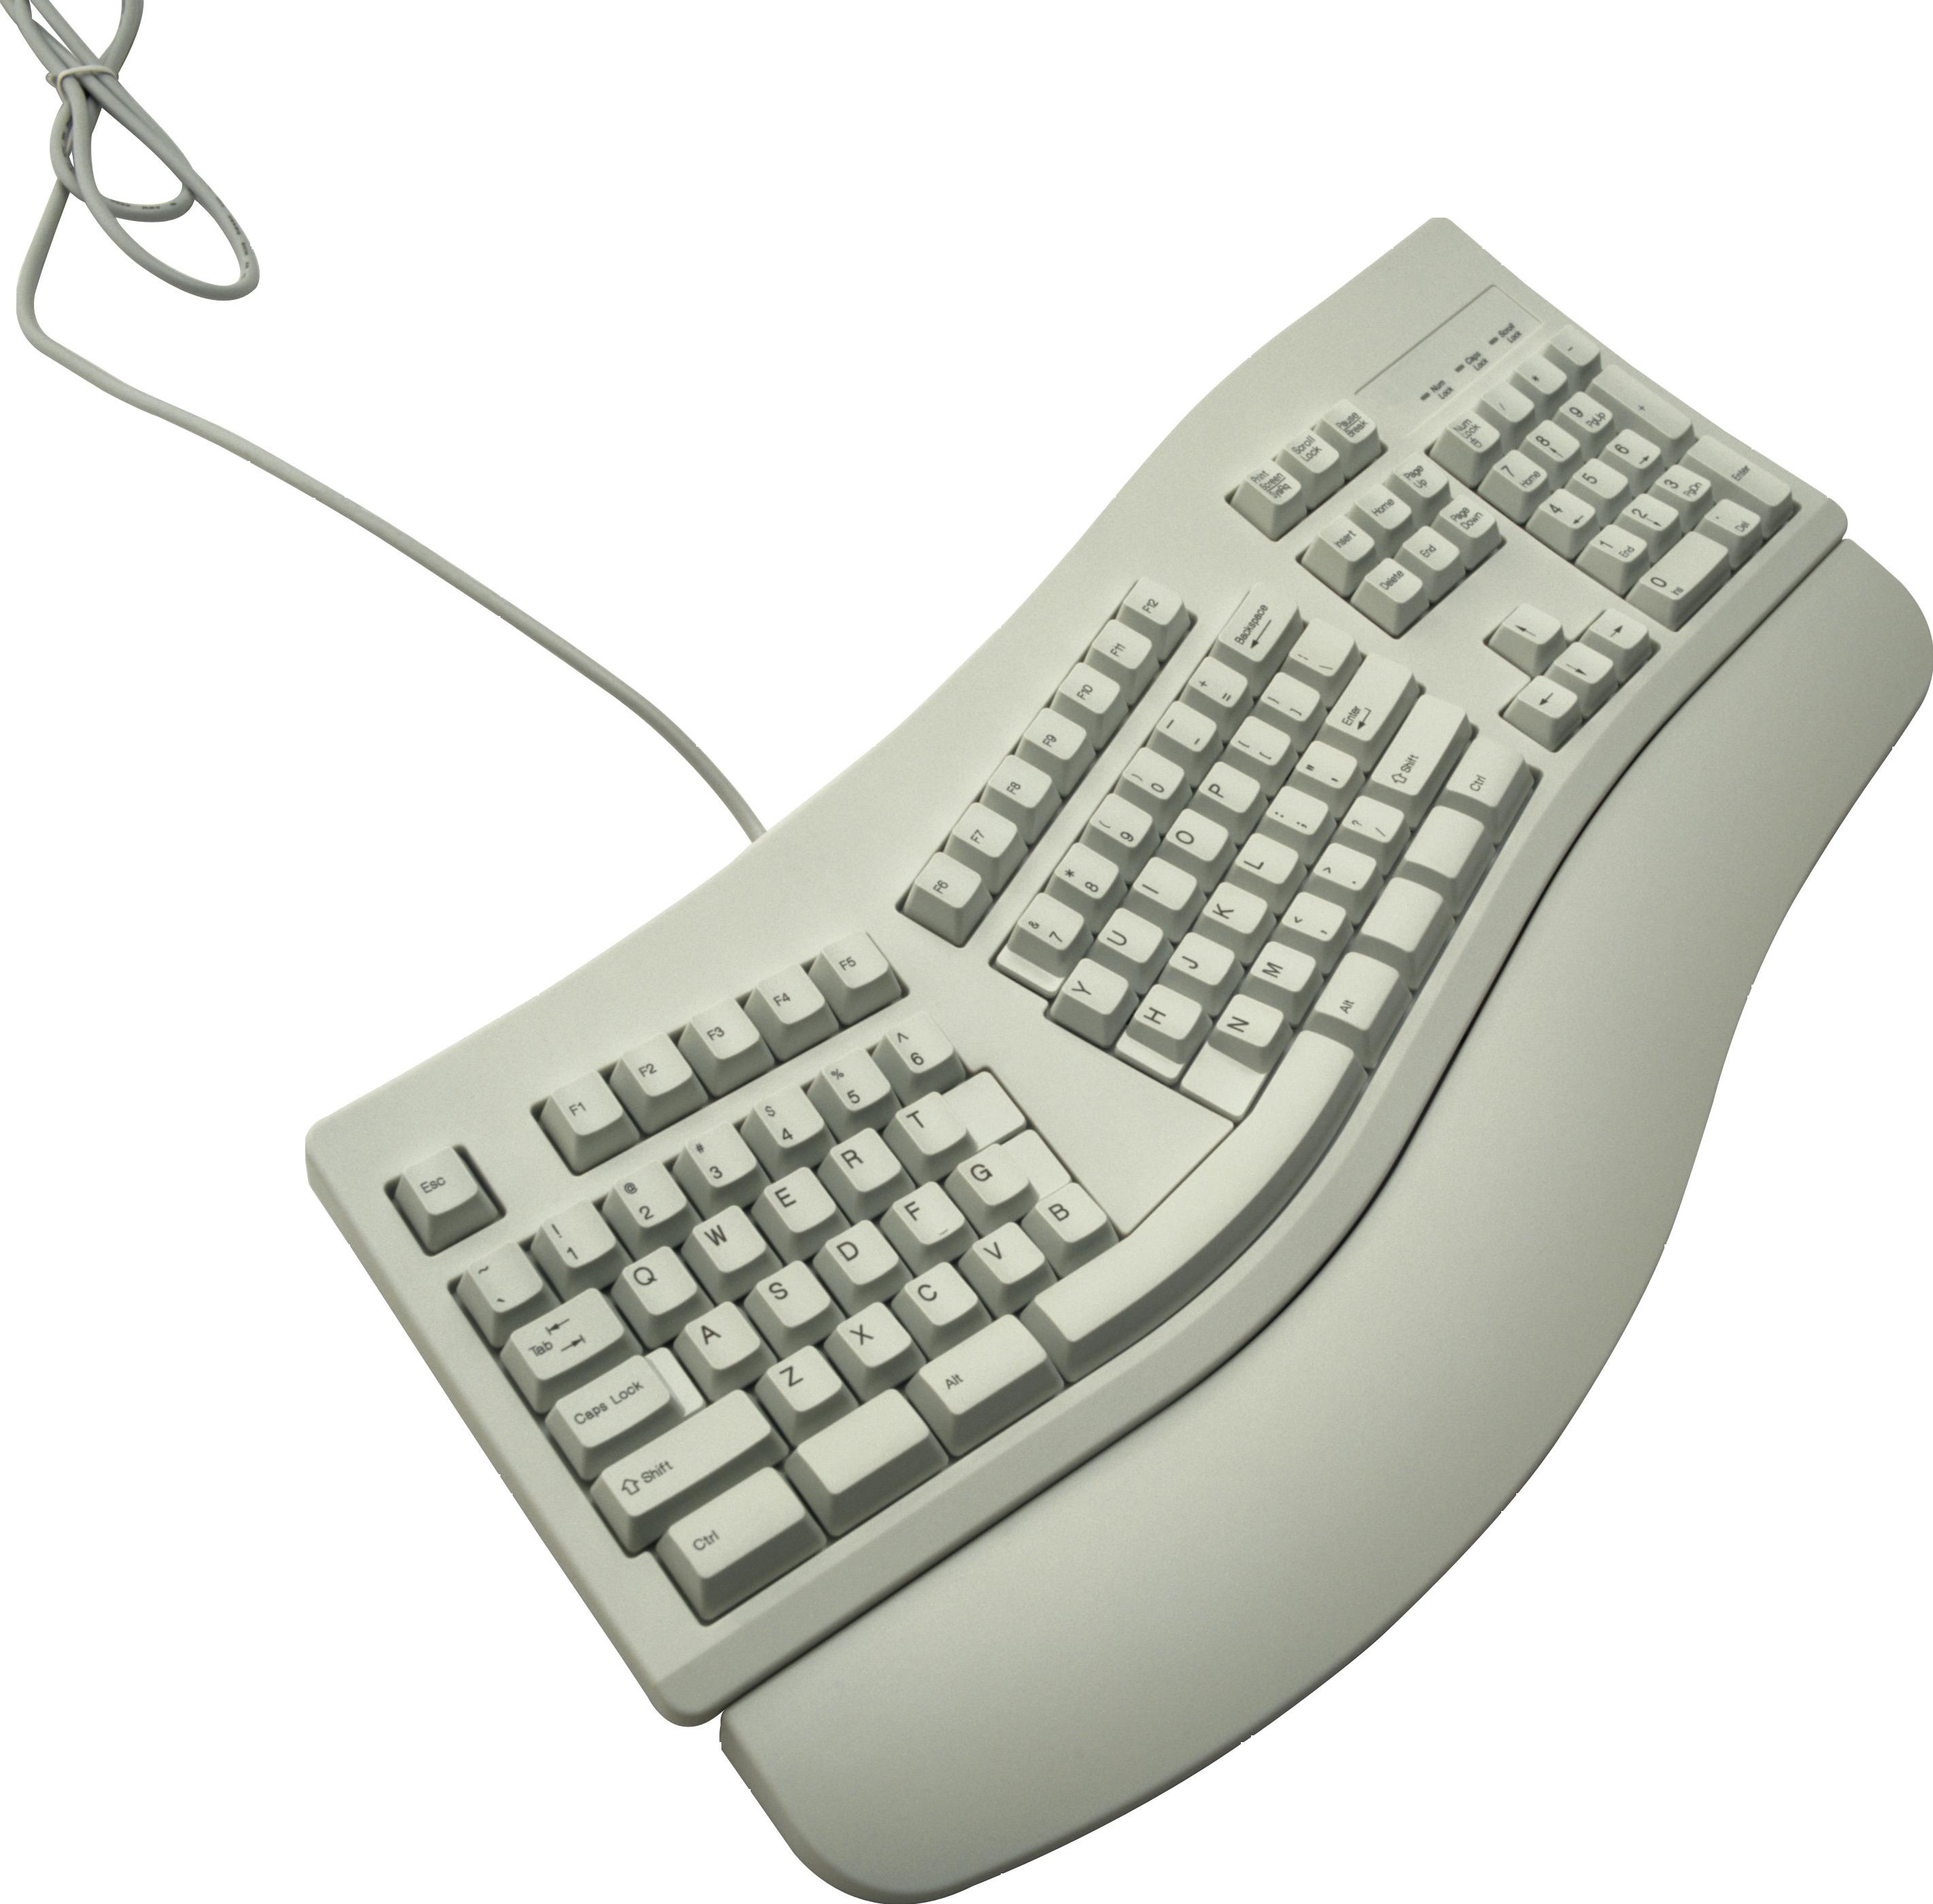 Клавиатура компьютера PNG фото